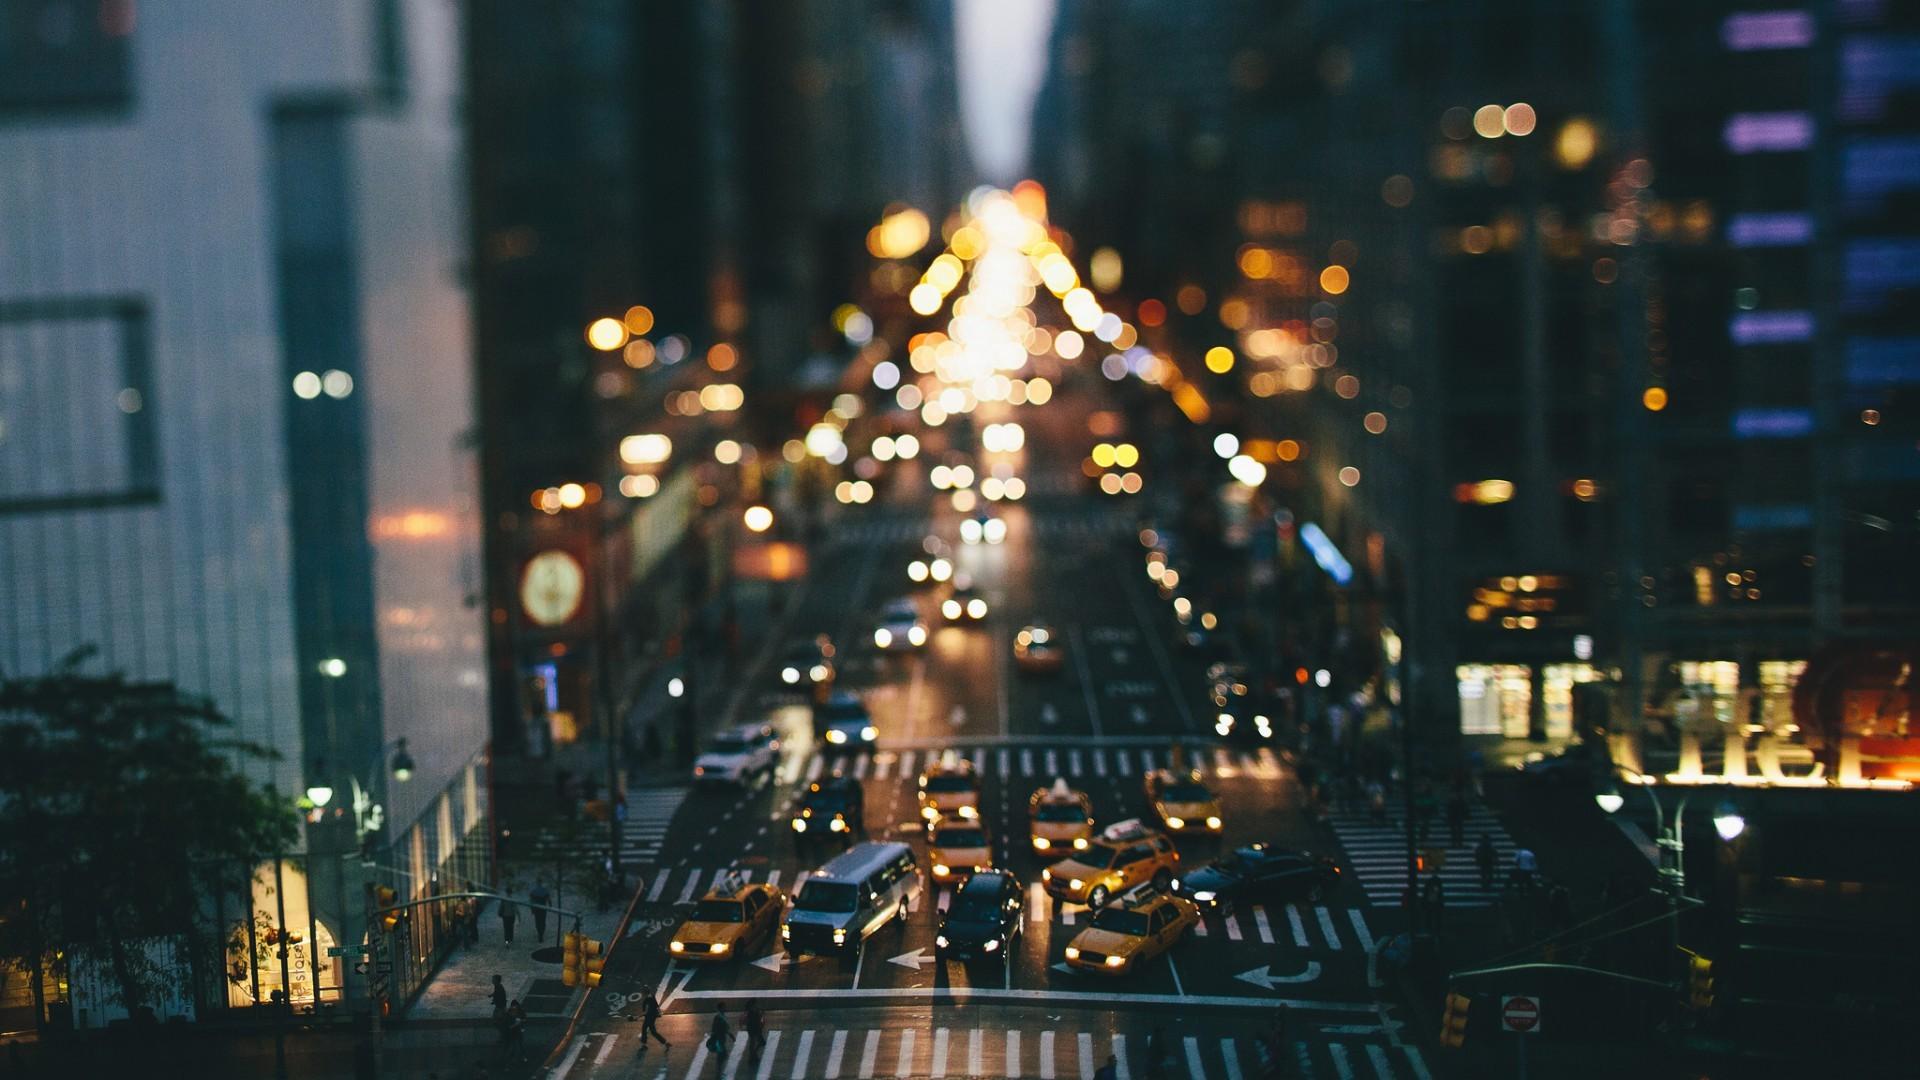 1920x1080 Px Car New York City Street Taxi Tilt Shift Traffic